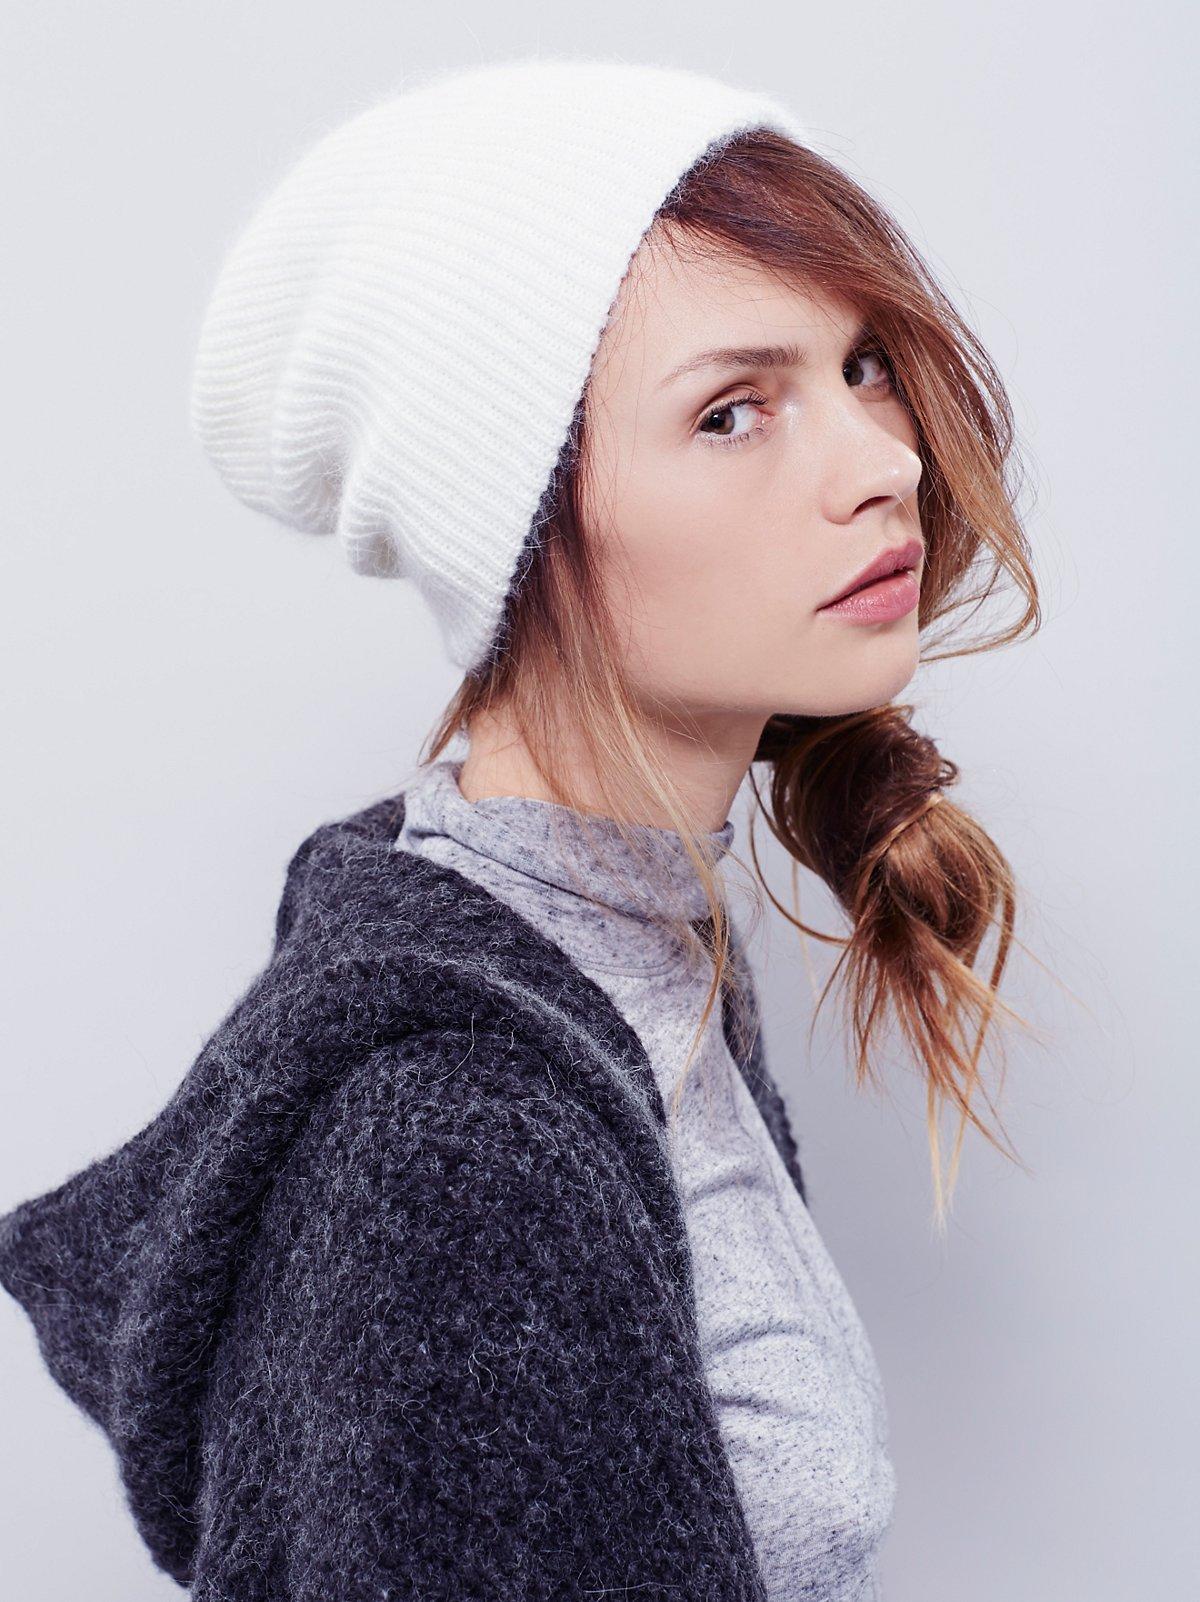 Axel Fuzzy Rub针织帽